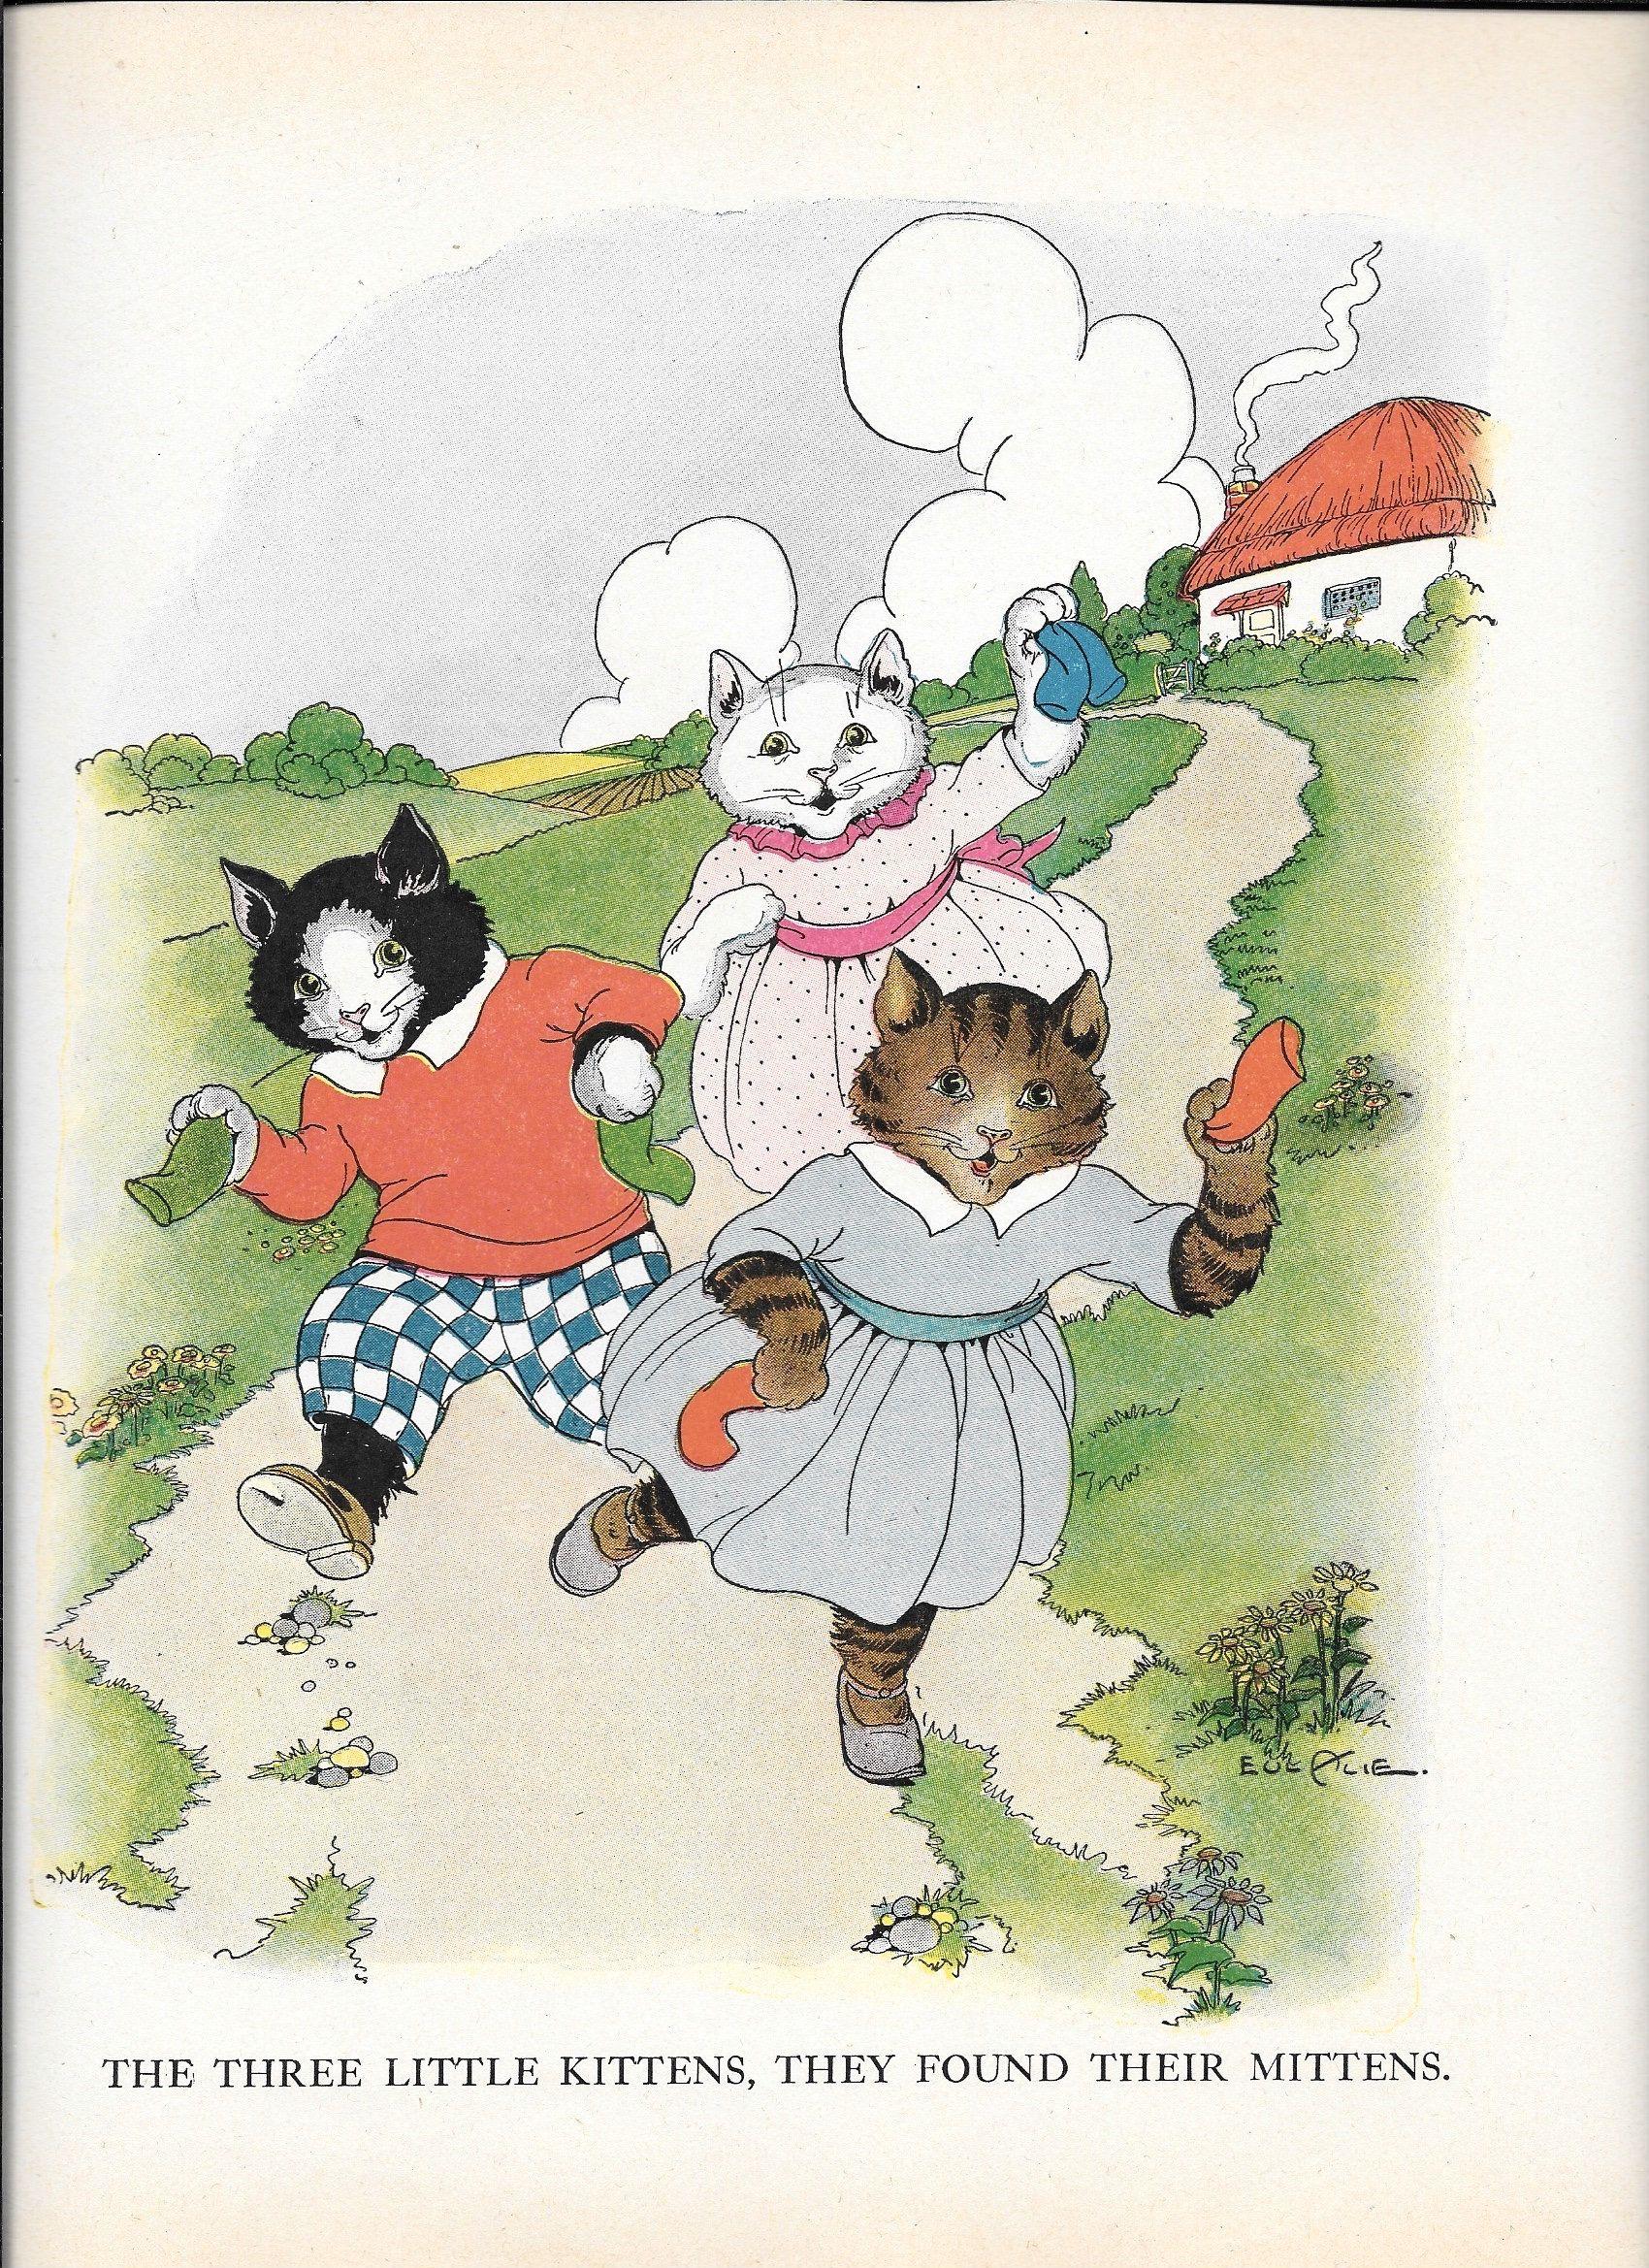 1932 Three Little Kittens Mother Goose Nursery Rhymes Etsy In 2020 Storybook Art Little Kittens Kids Story Books